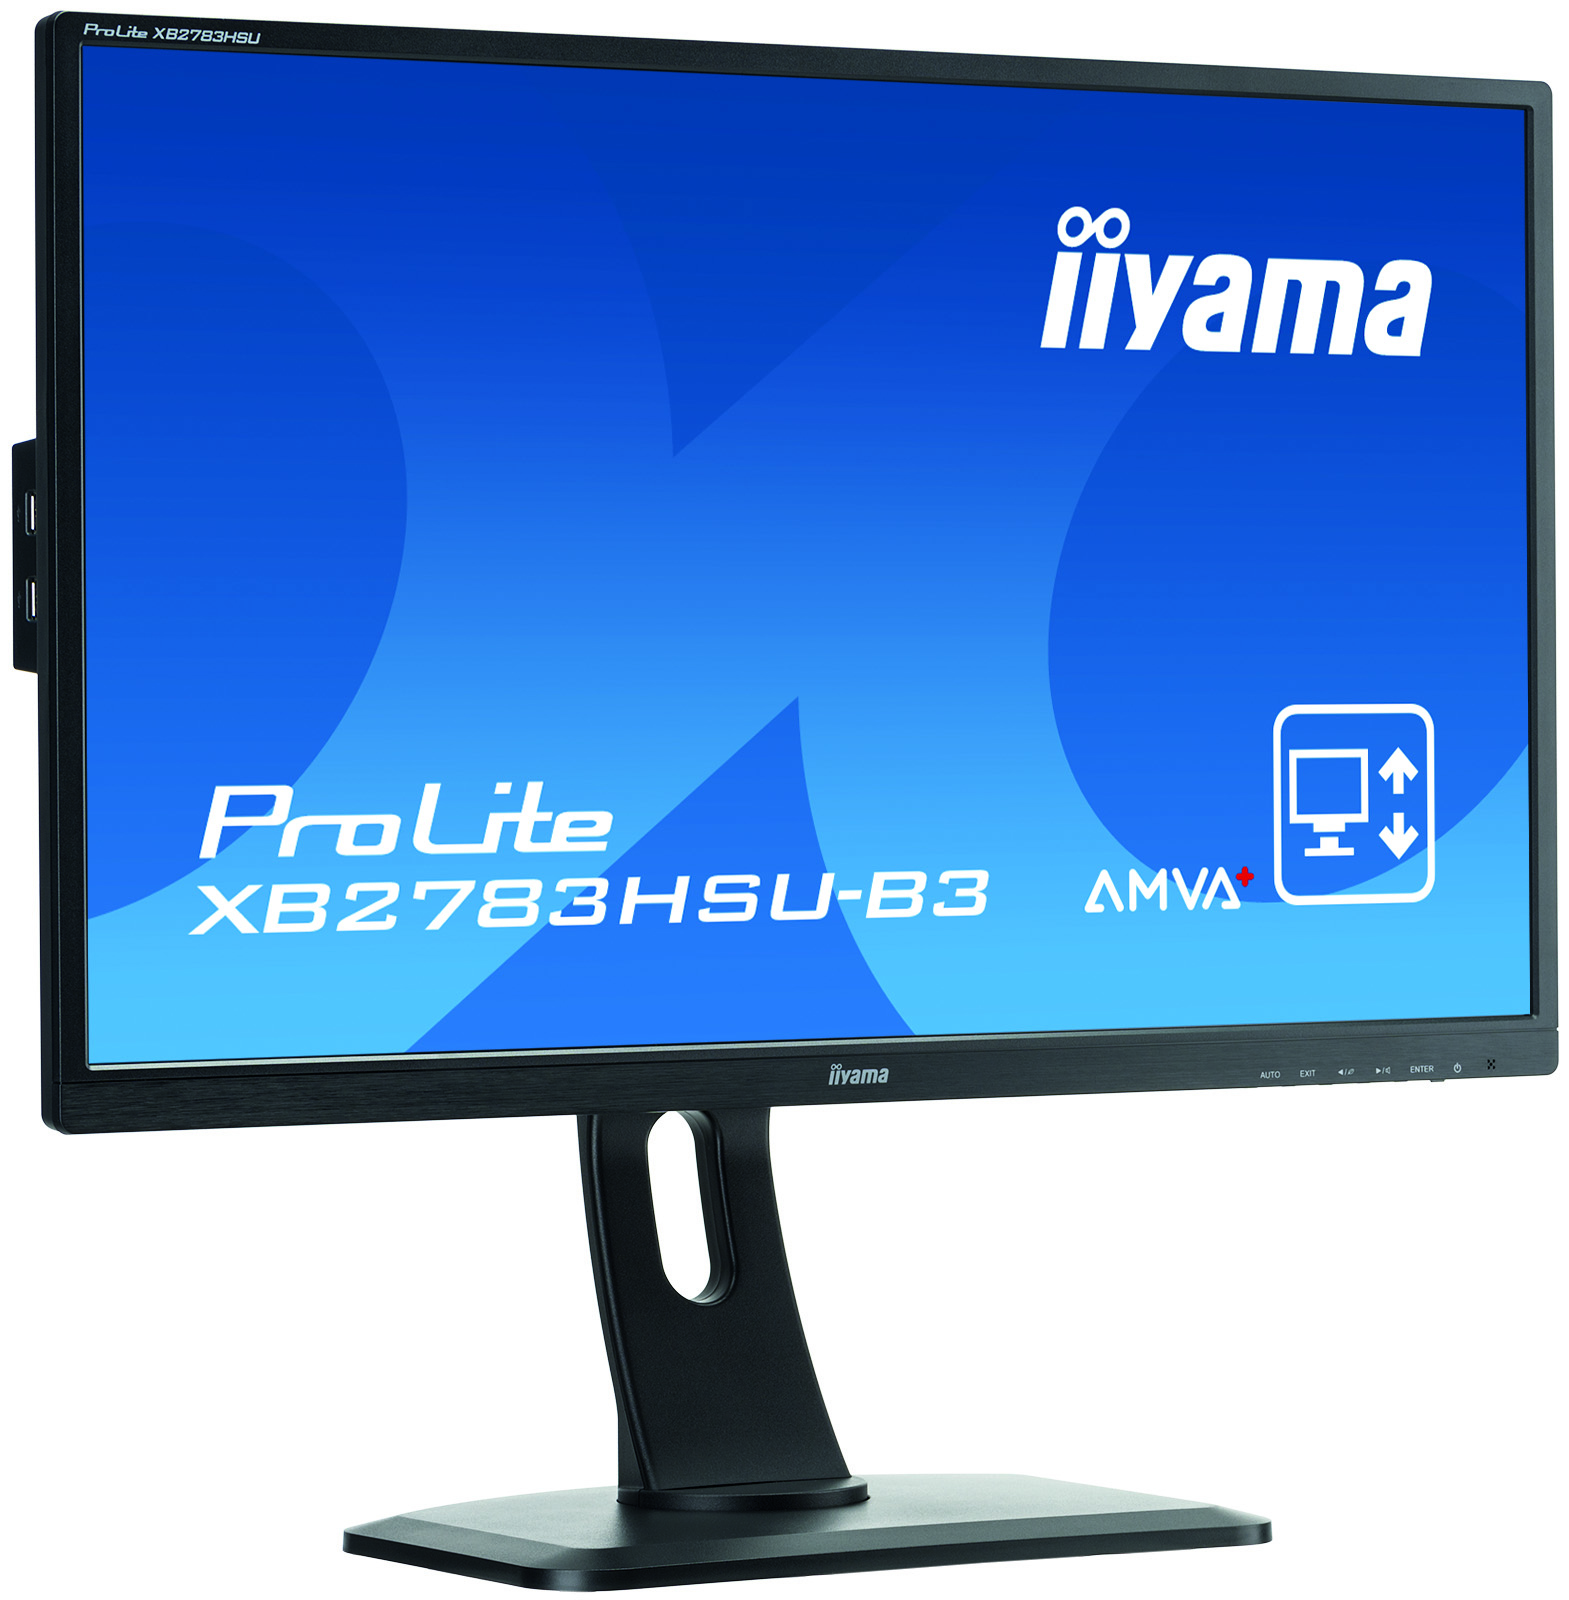 iiyama ProLite XB2783HSU-B3 computer monitor 68.6 cm (27